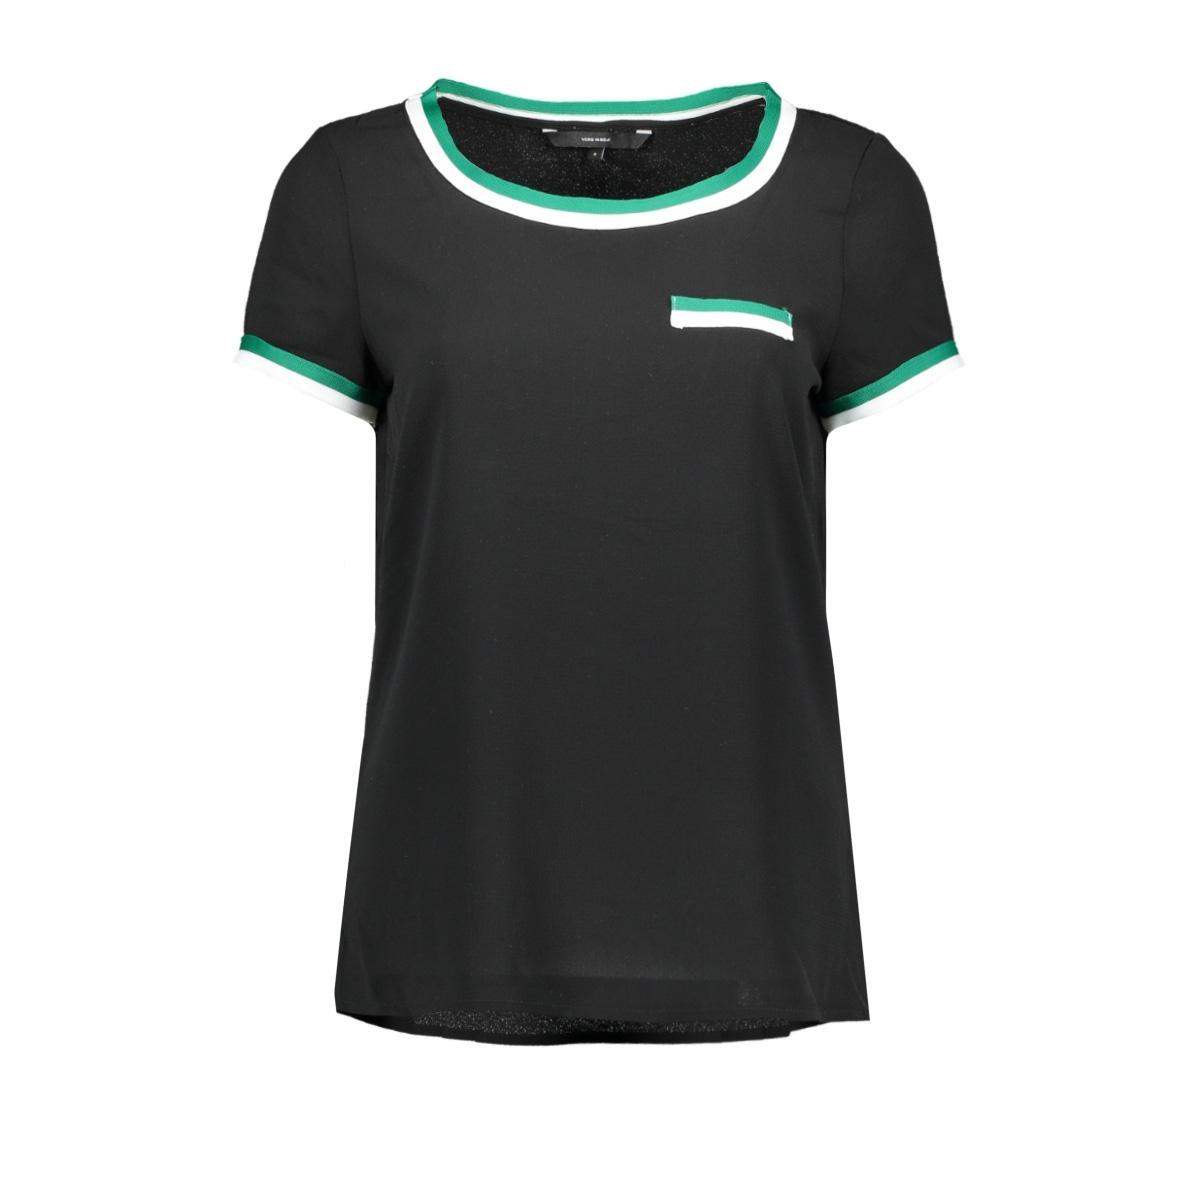 vmsasha ss panel top 10216853 vero moda t-shirt black/alpine green